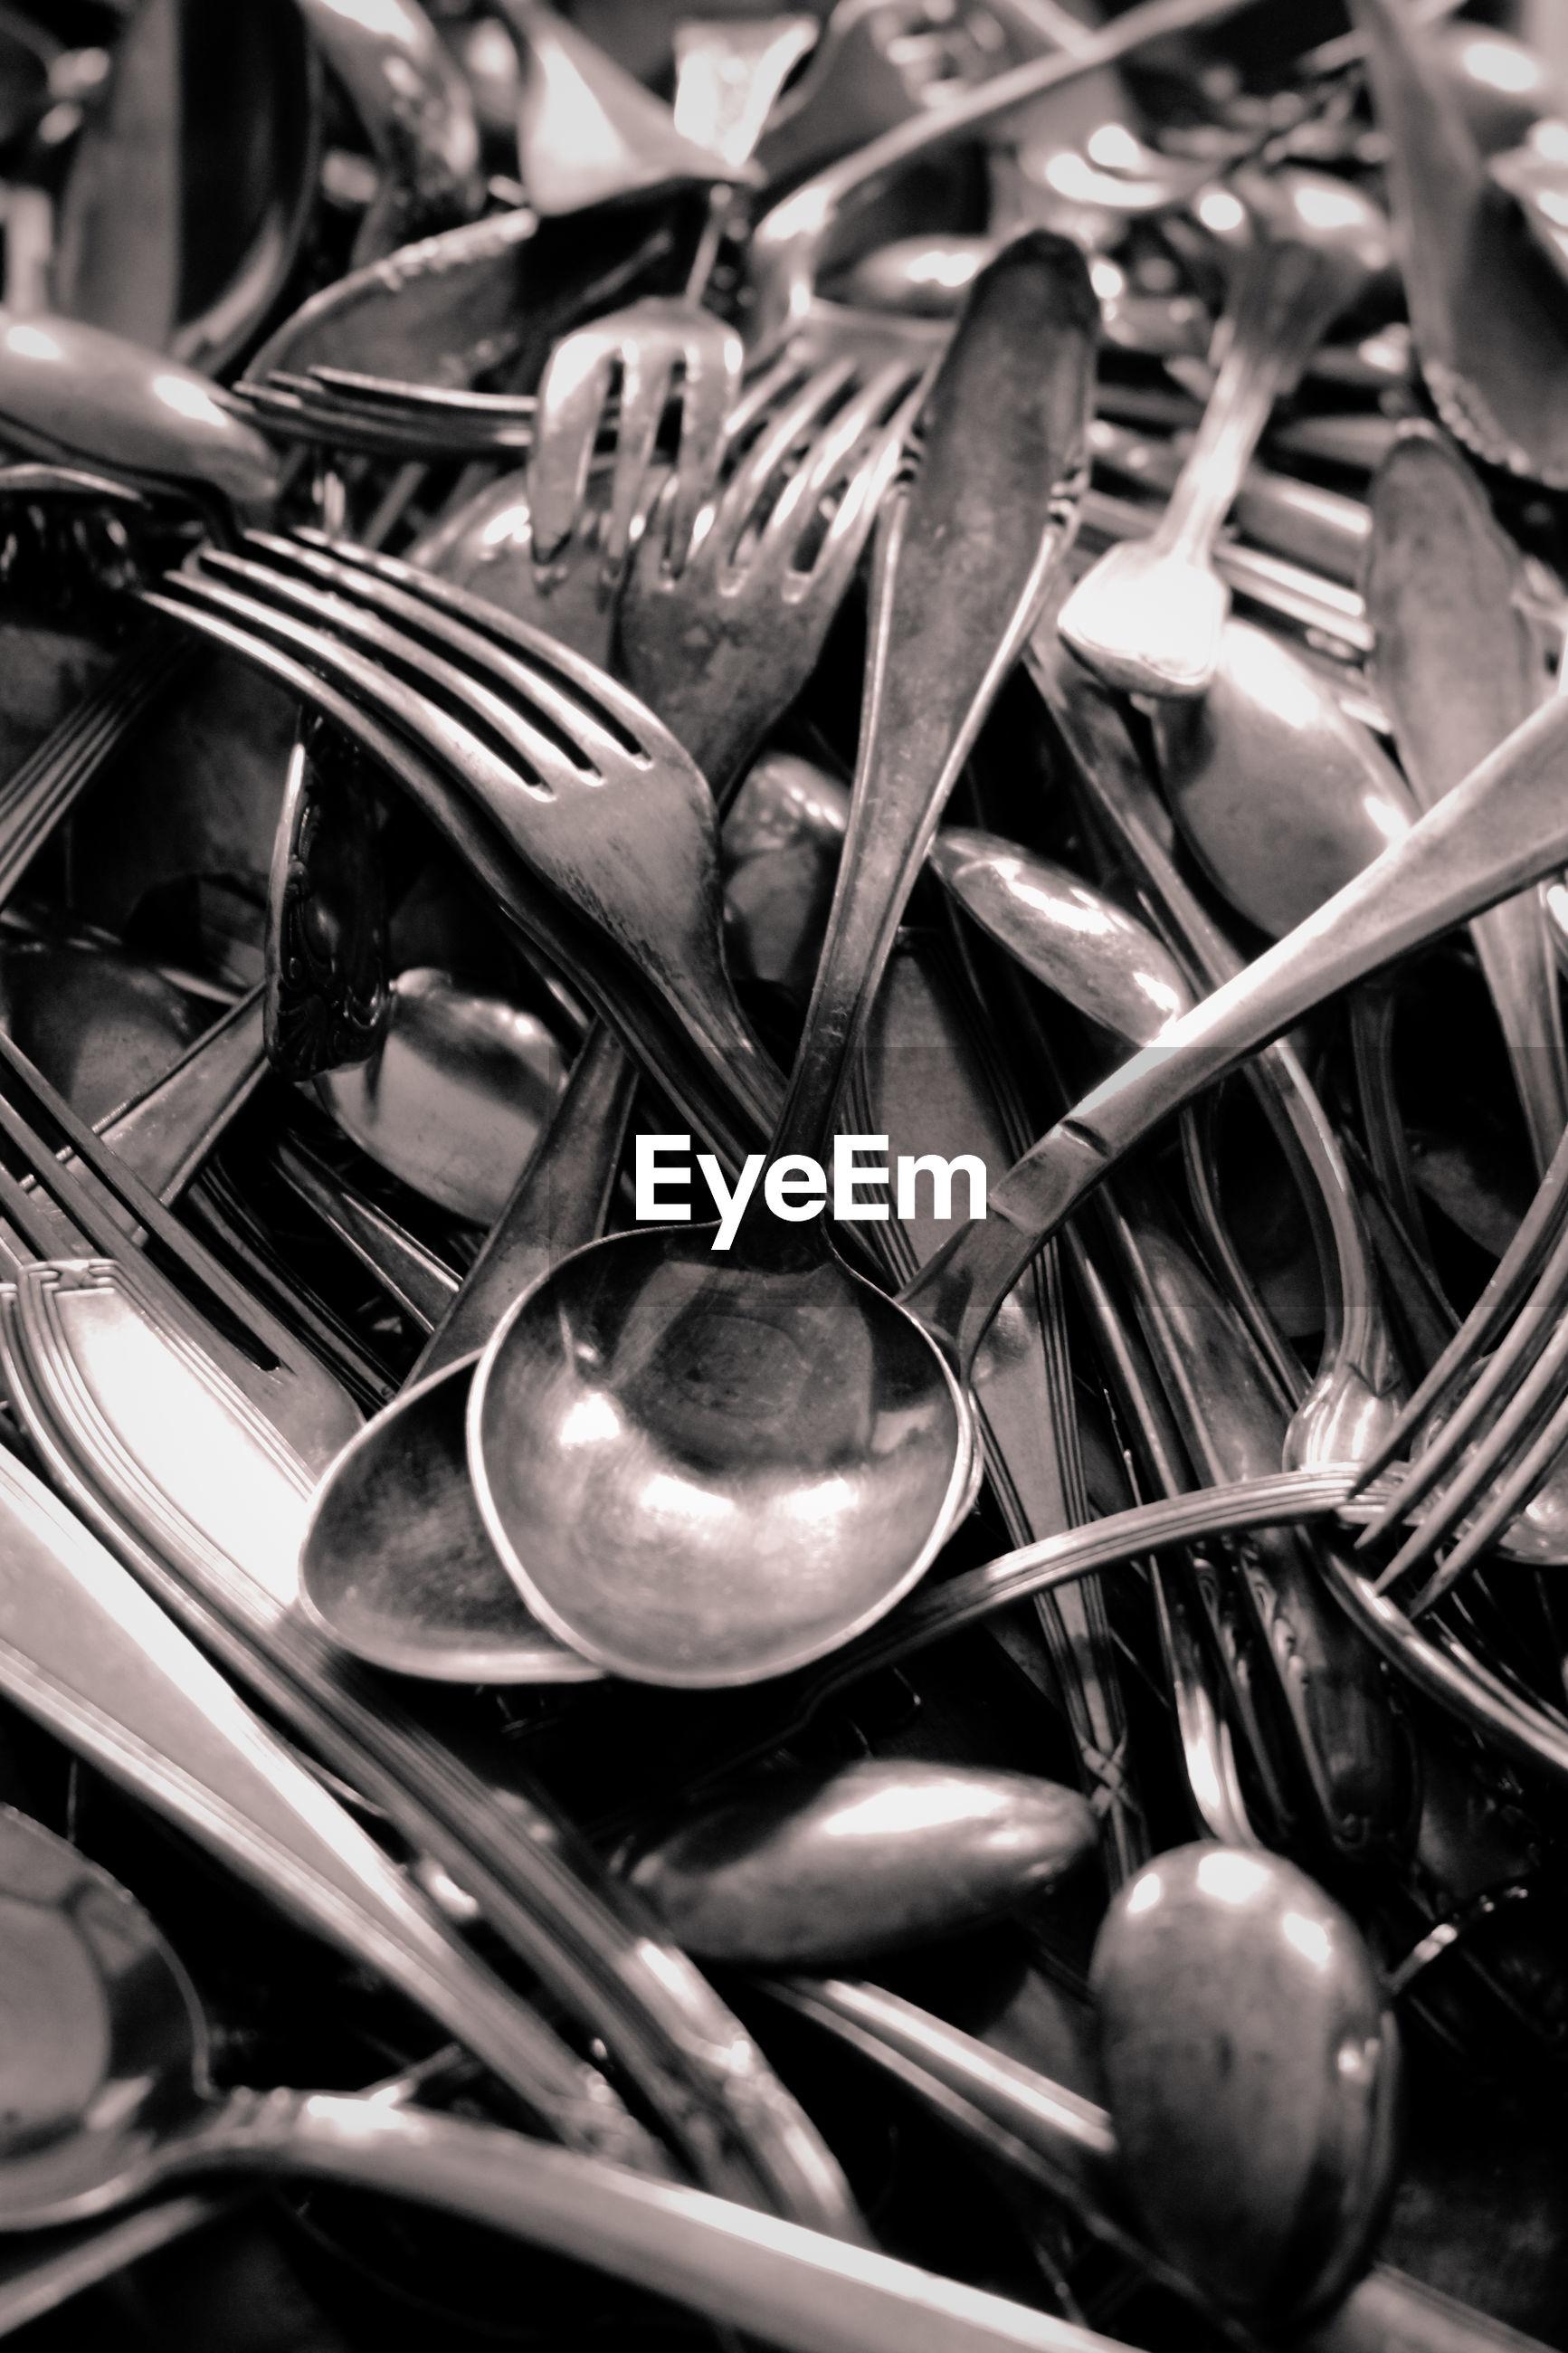 Full frame shot of spoons and forks